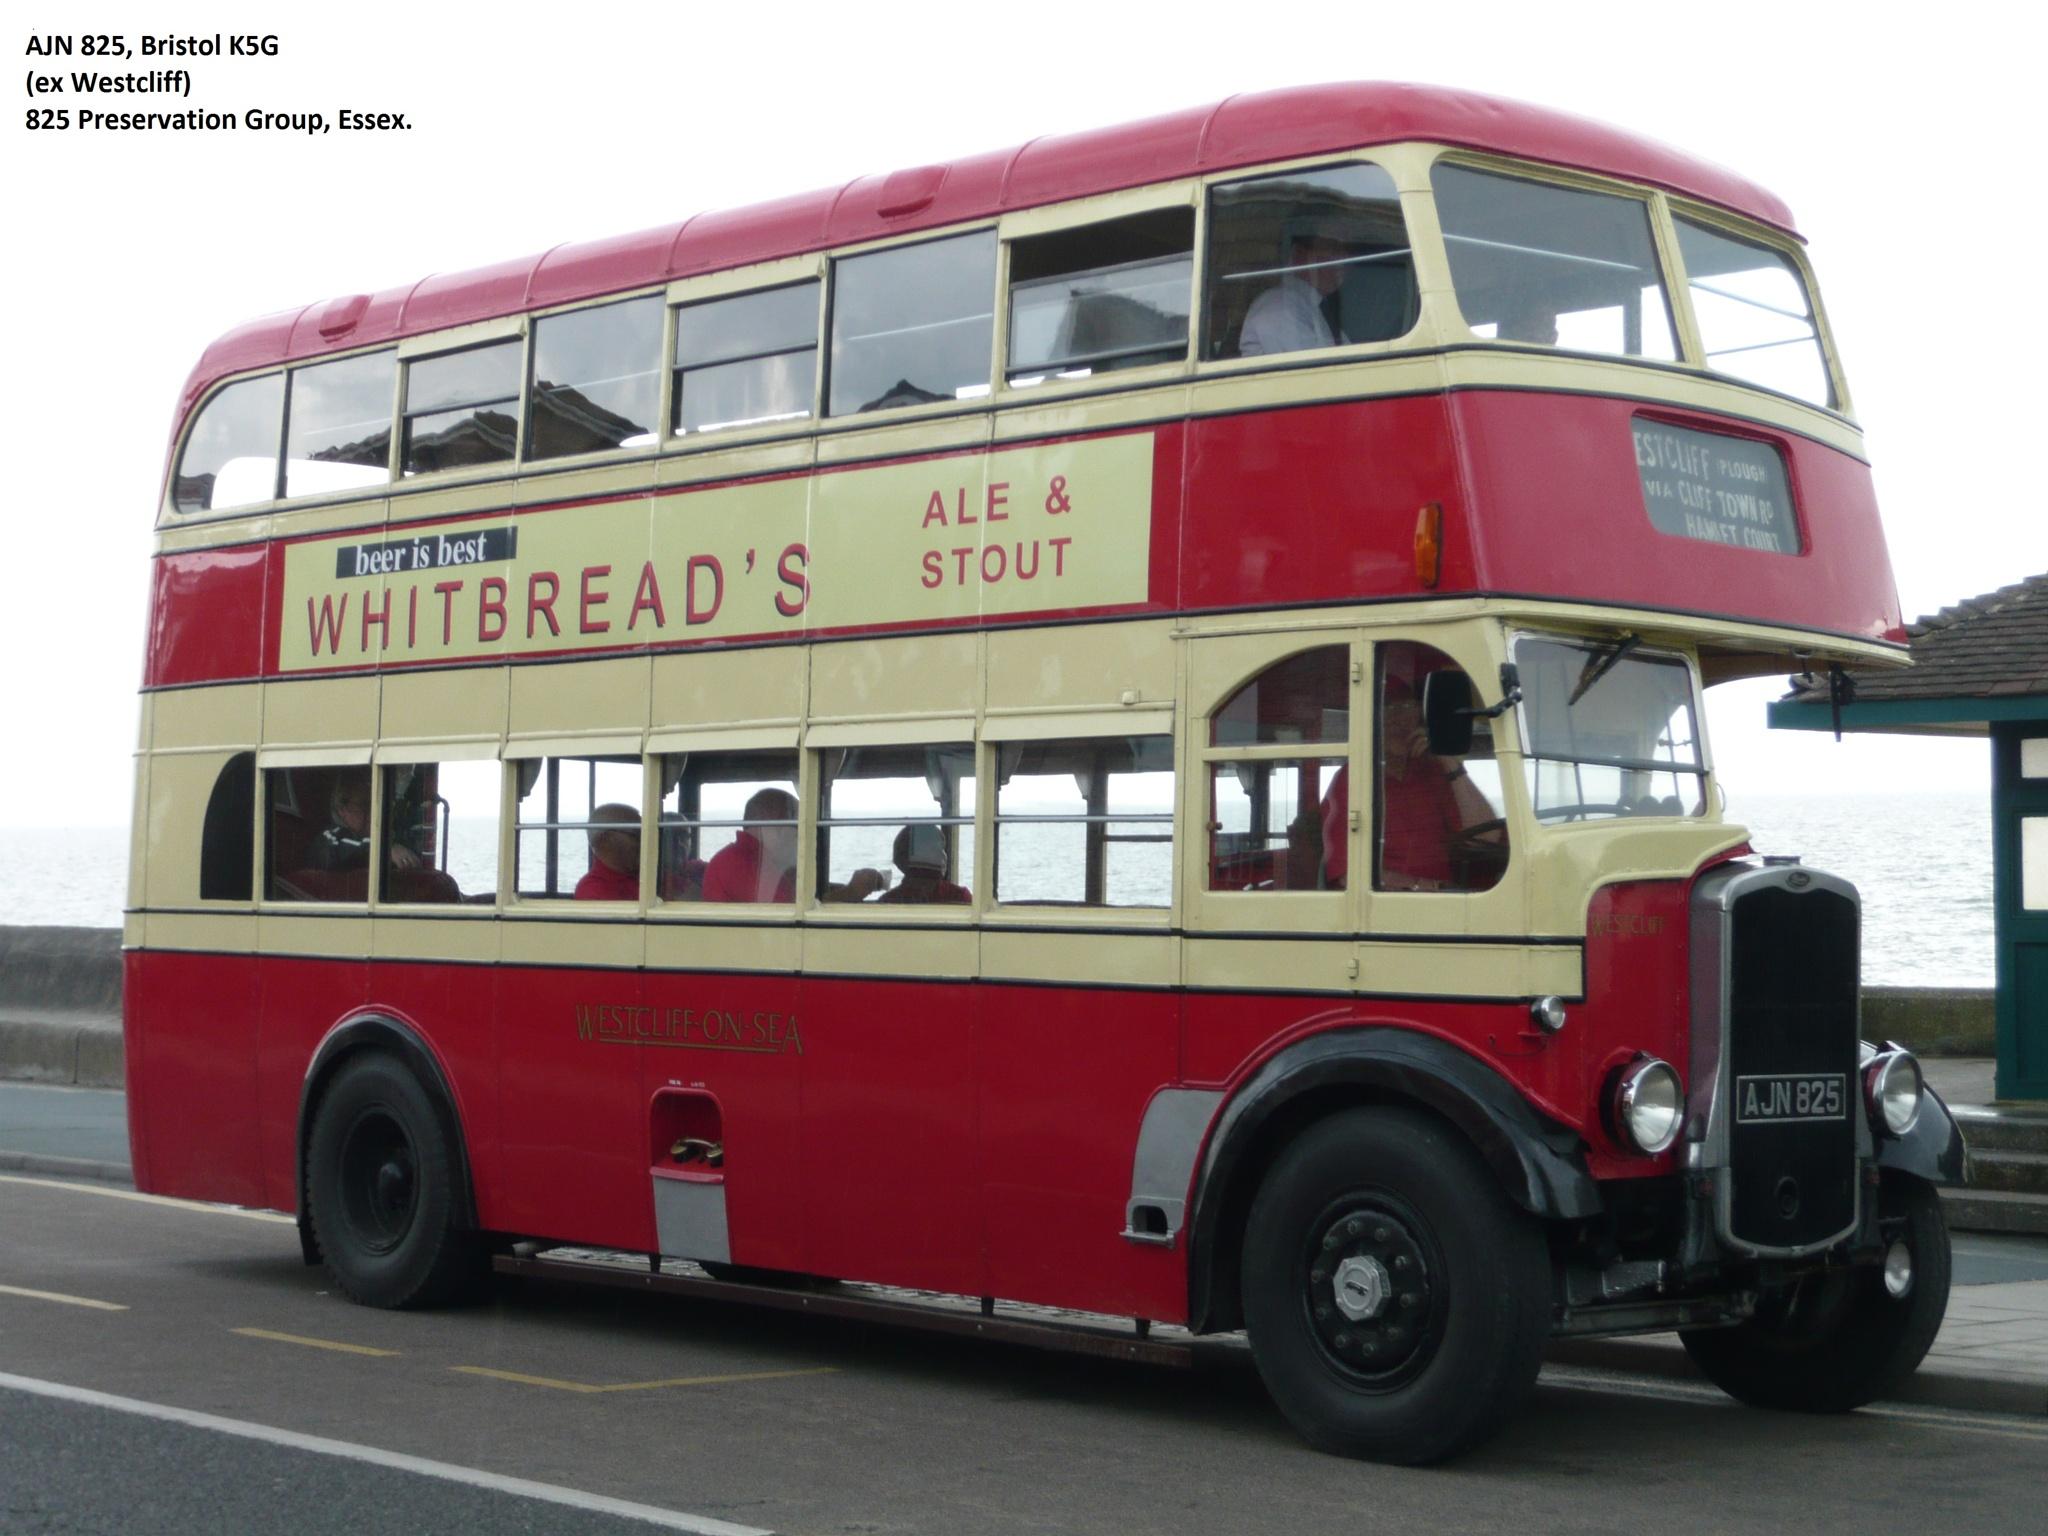 Bristol K5G (AJN825) by Bob Durrant.64